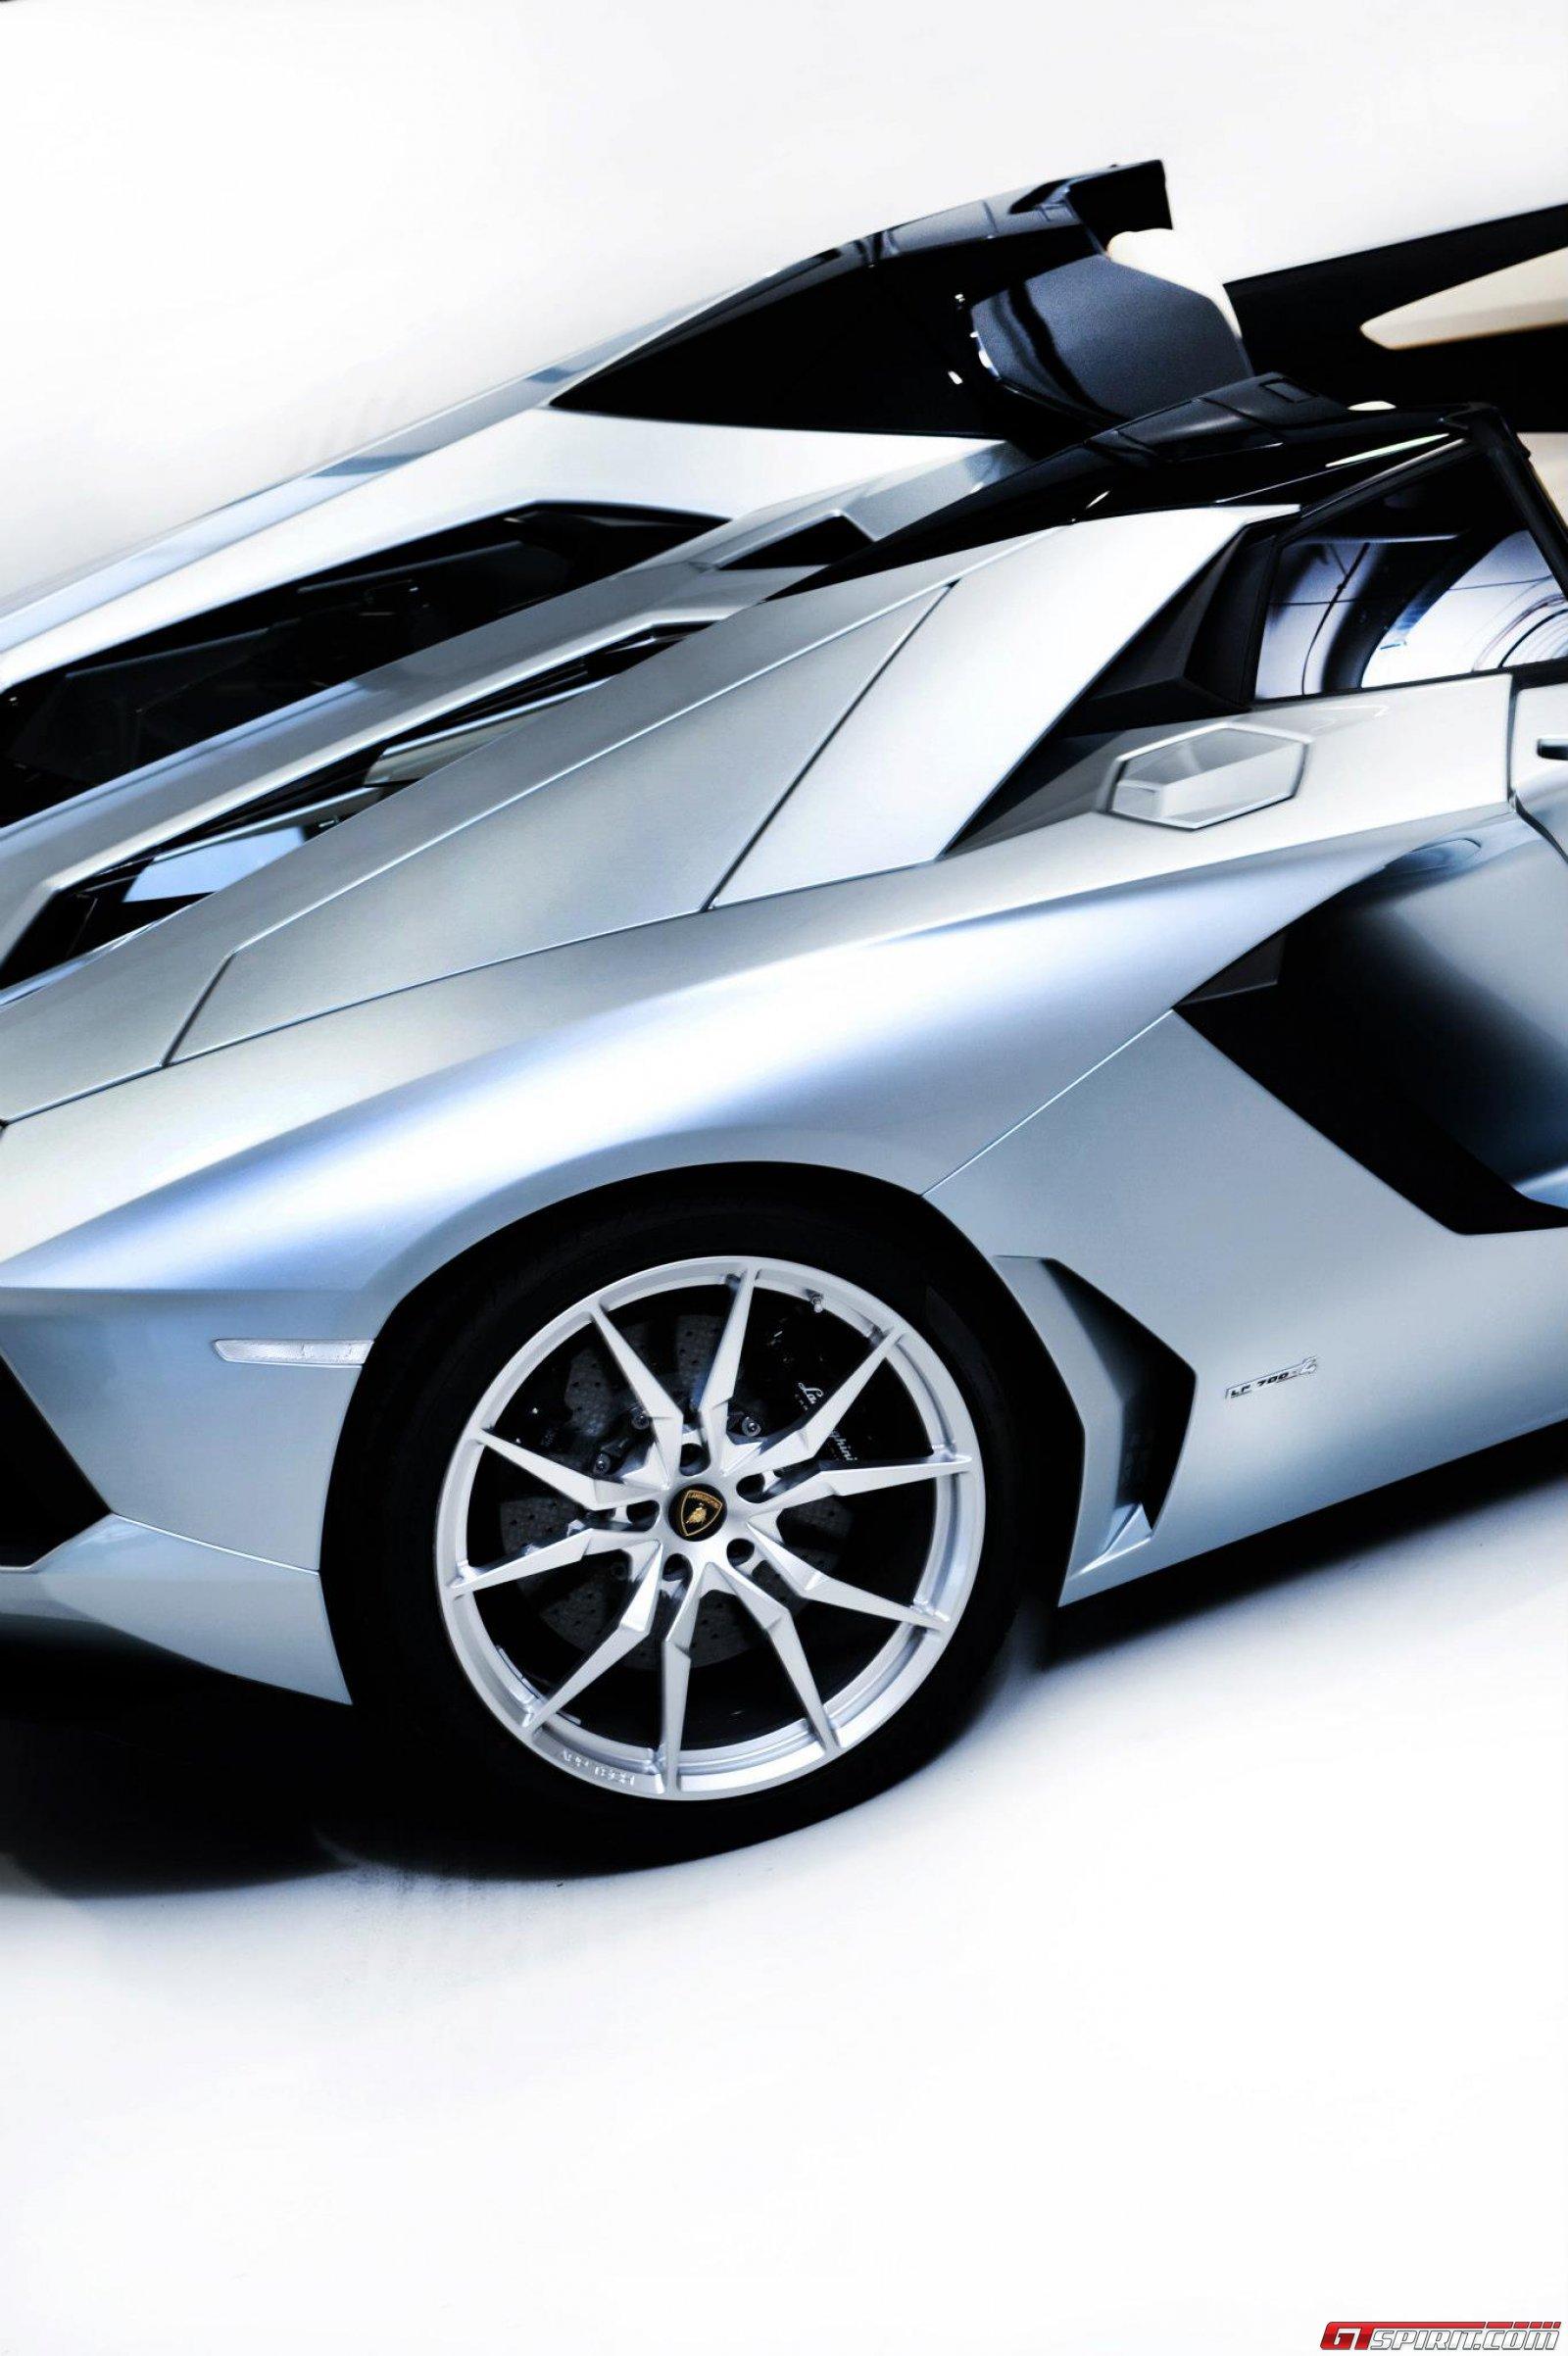 2013 Lamborghini Aventador LP700-4 Roadster Photo 28